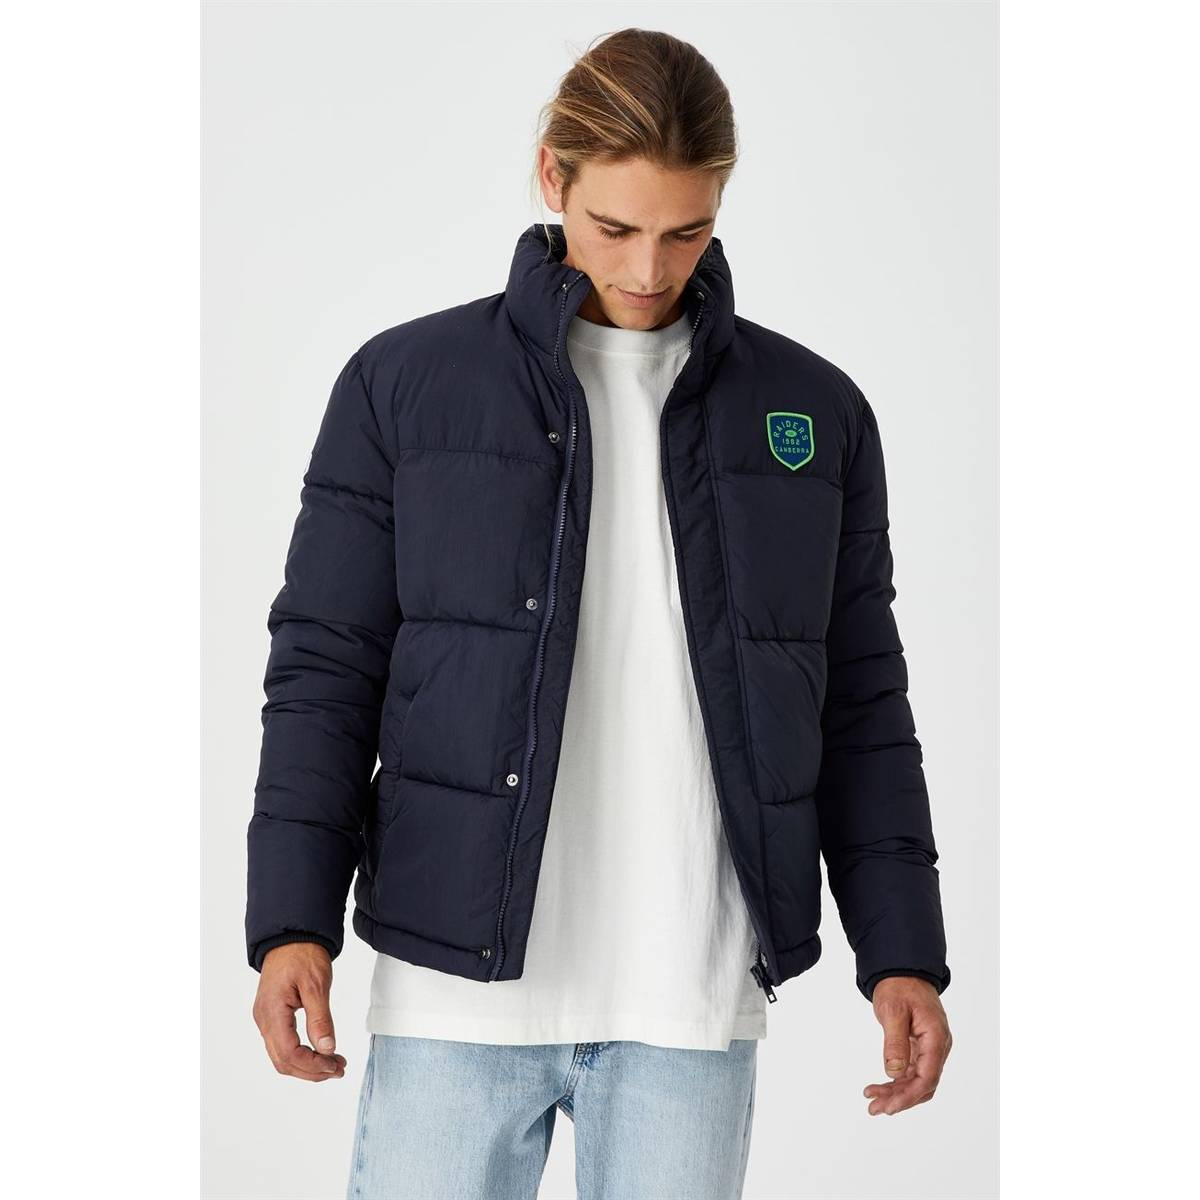 NRL Mens Team Puffer Jacket0